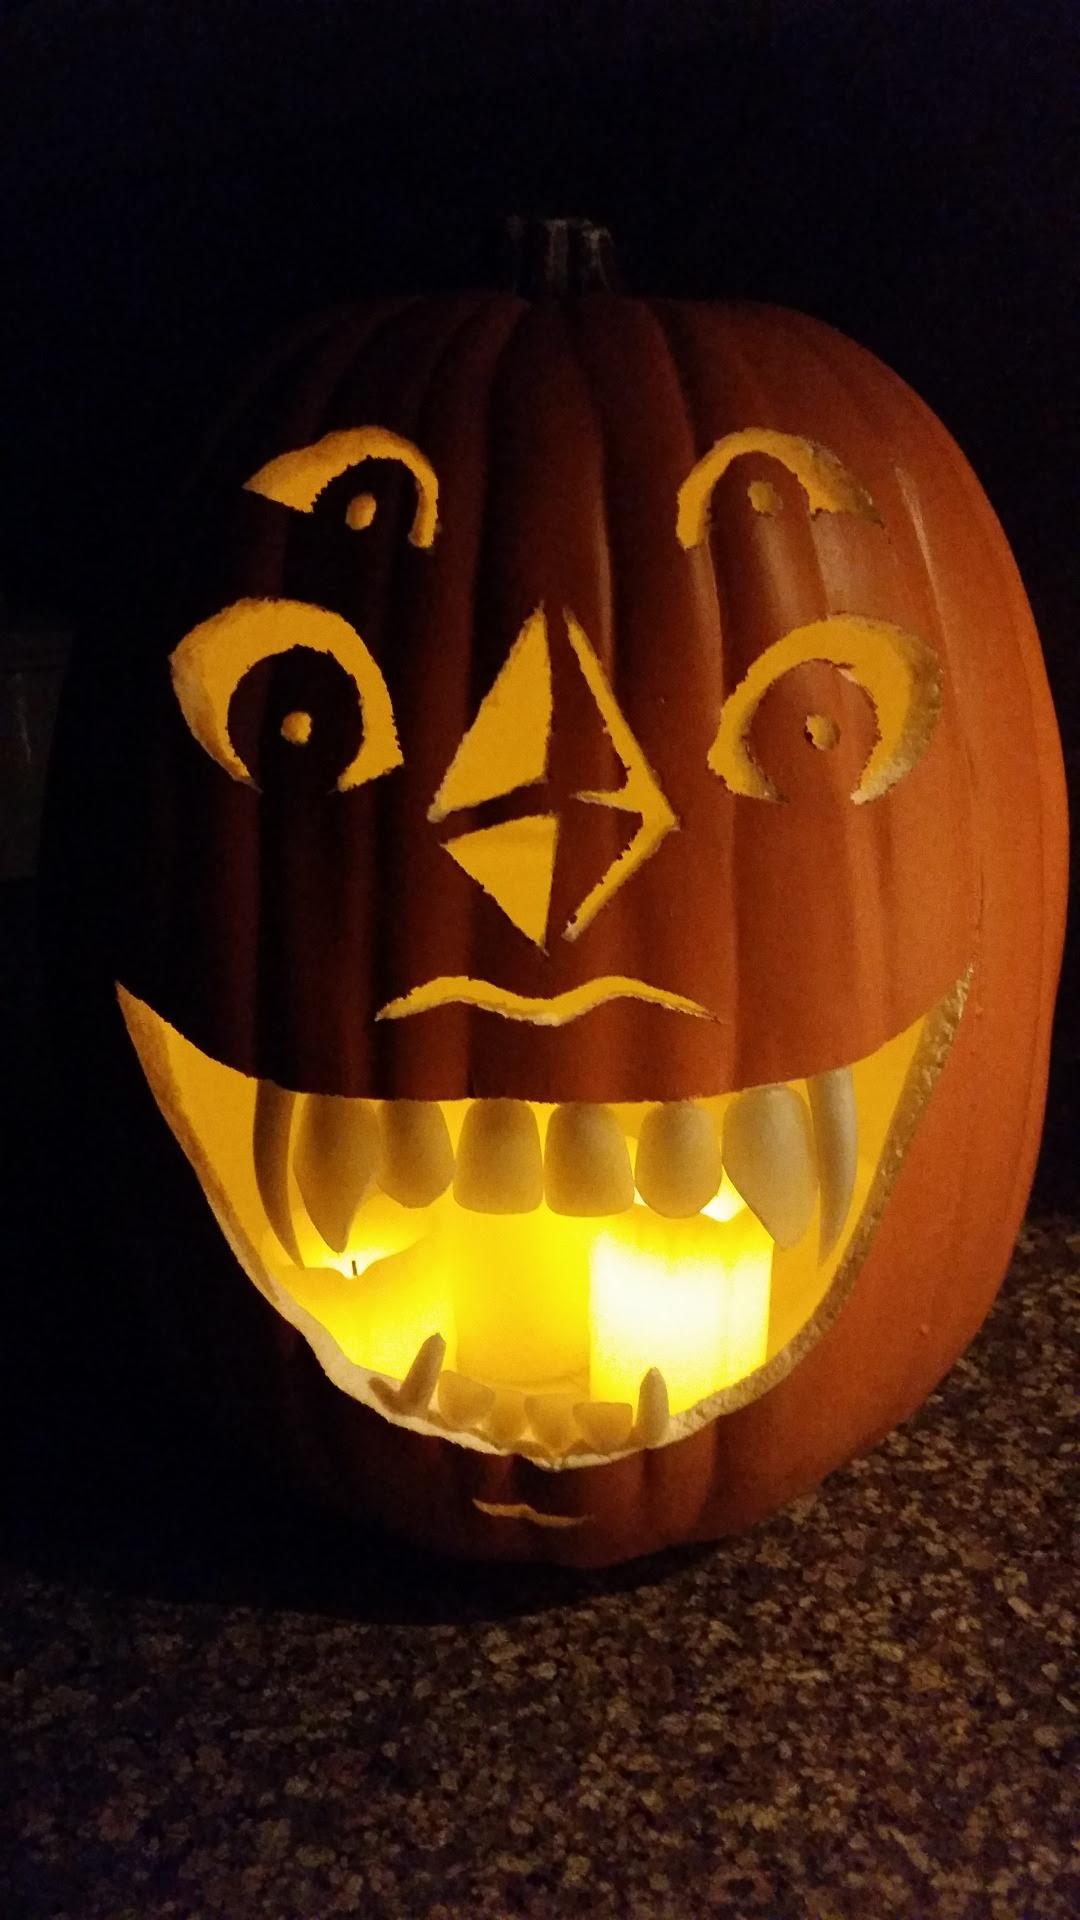 Check out the Malachite jack-o-lantern I made!